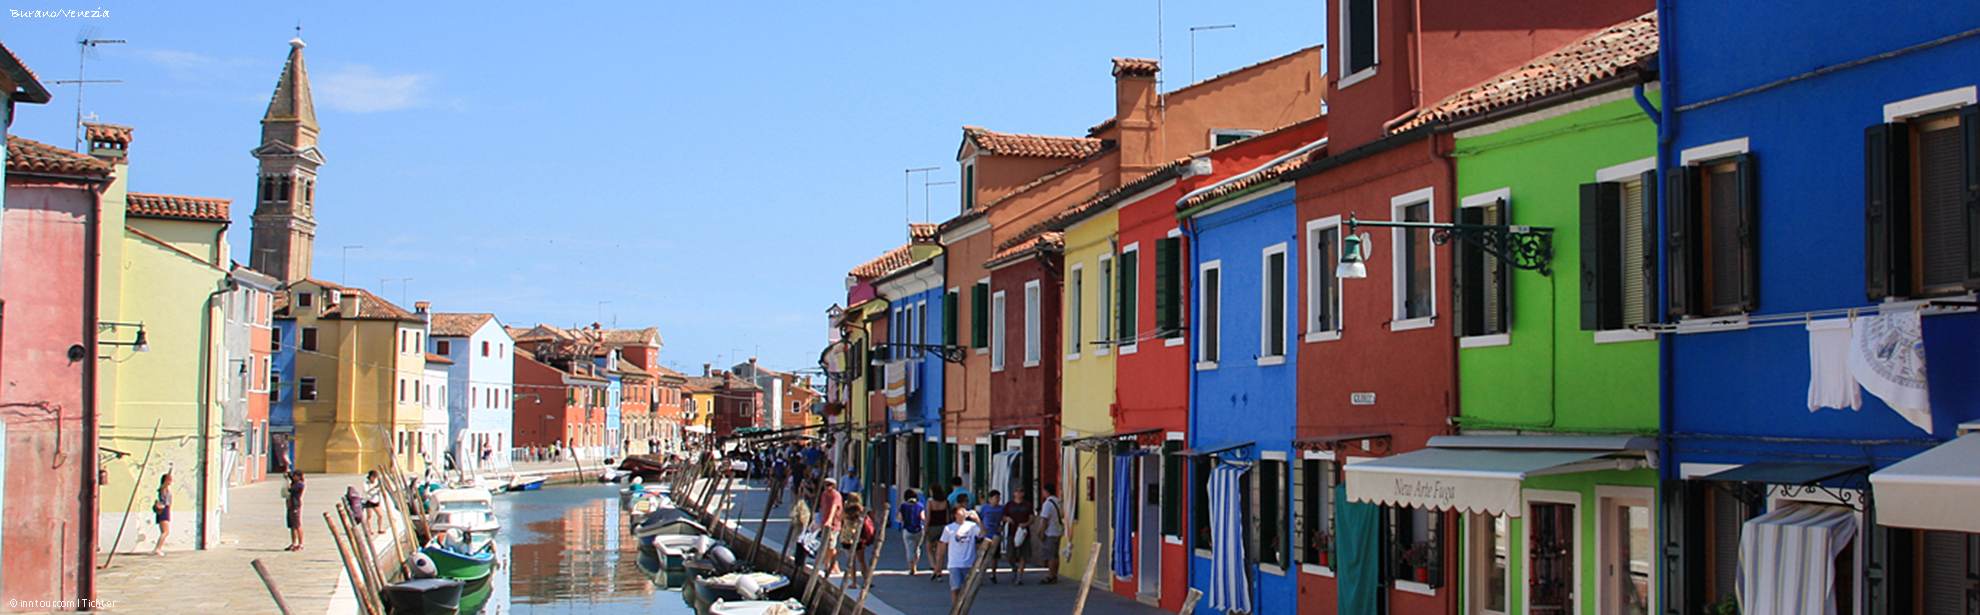 Osportinntour_Tichter_Burano-Venezia_IMG_3560-2